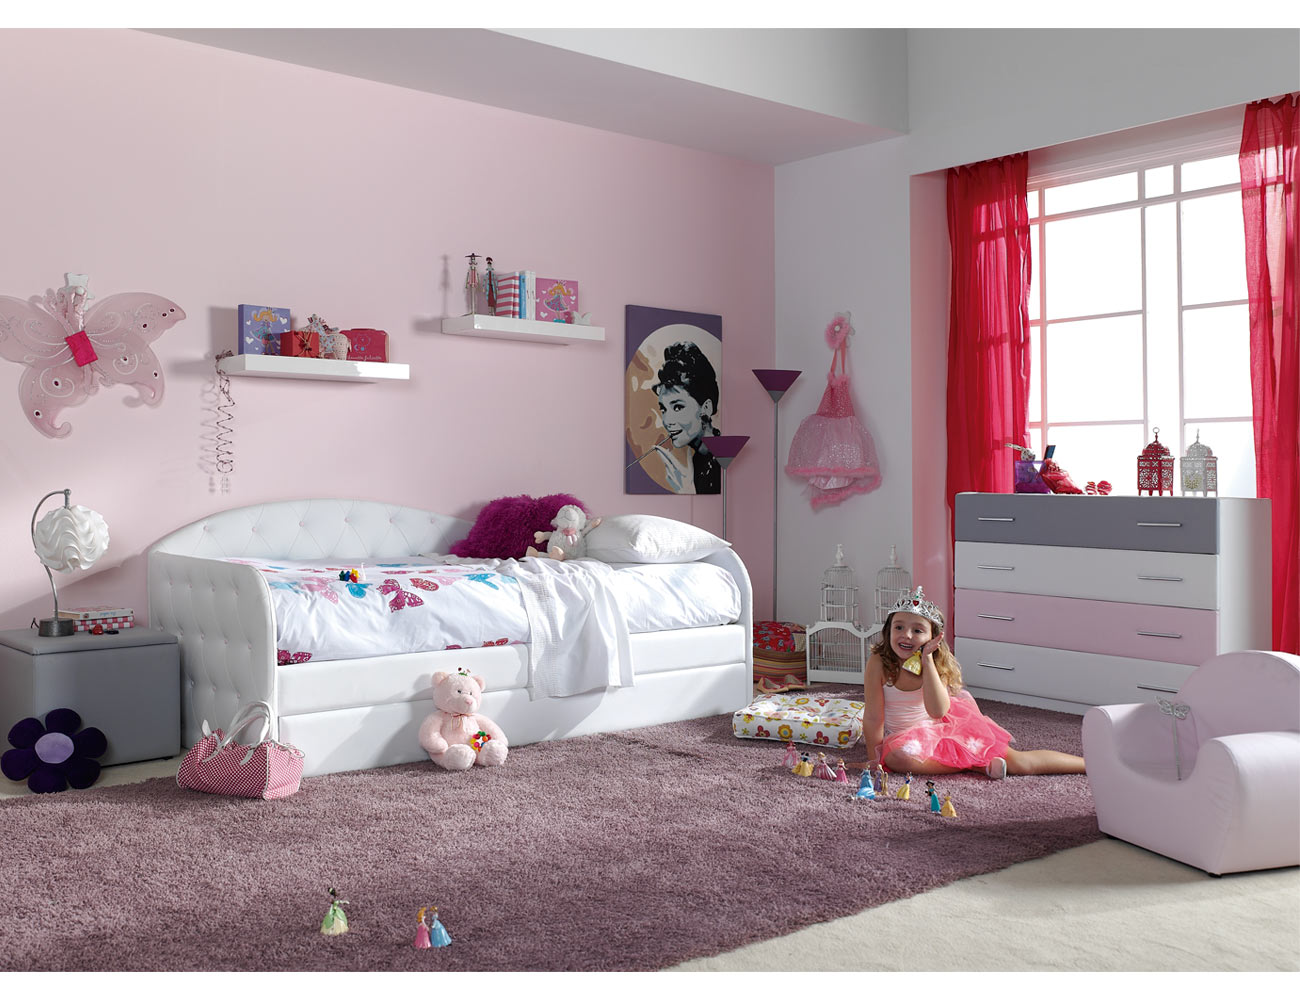 243 cama nido19